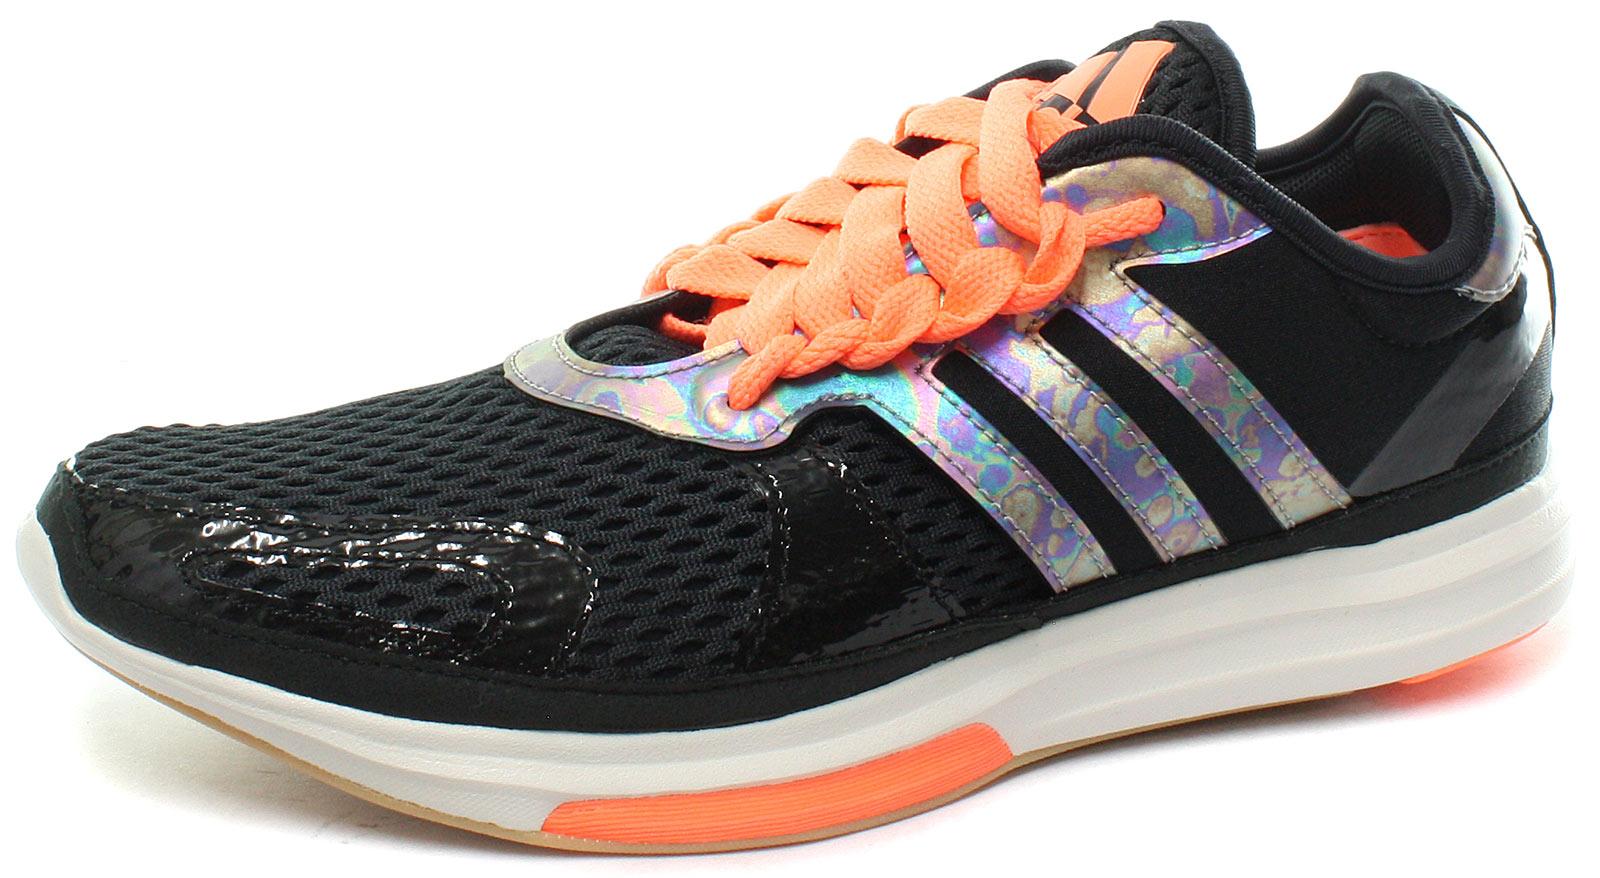 New adidas Stella McCartney Yvori Damenschuhe Training Schuhes ALL SIZES